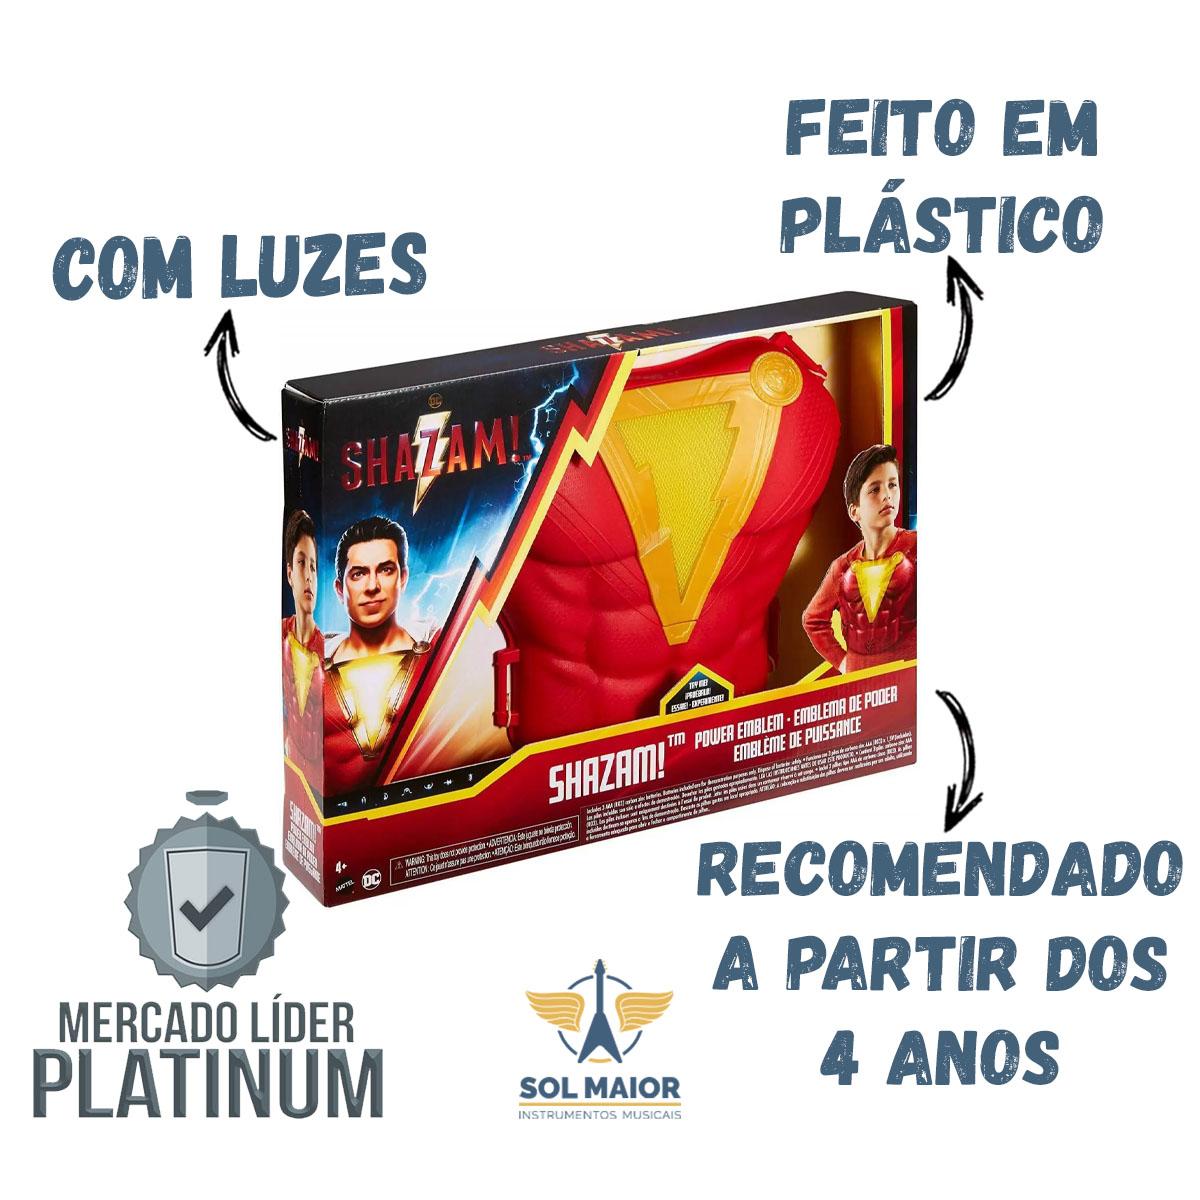 Brinquedo Peitoril Shazam C/ Luzes E Sons Mattel Gdn19